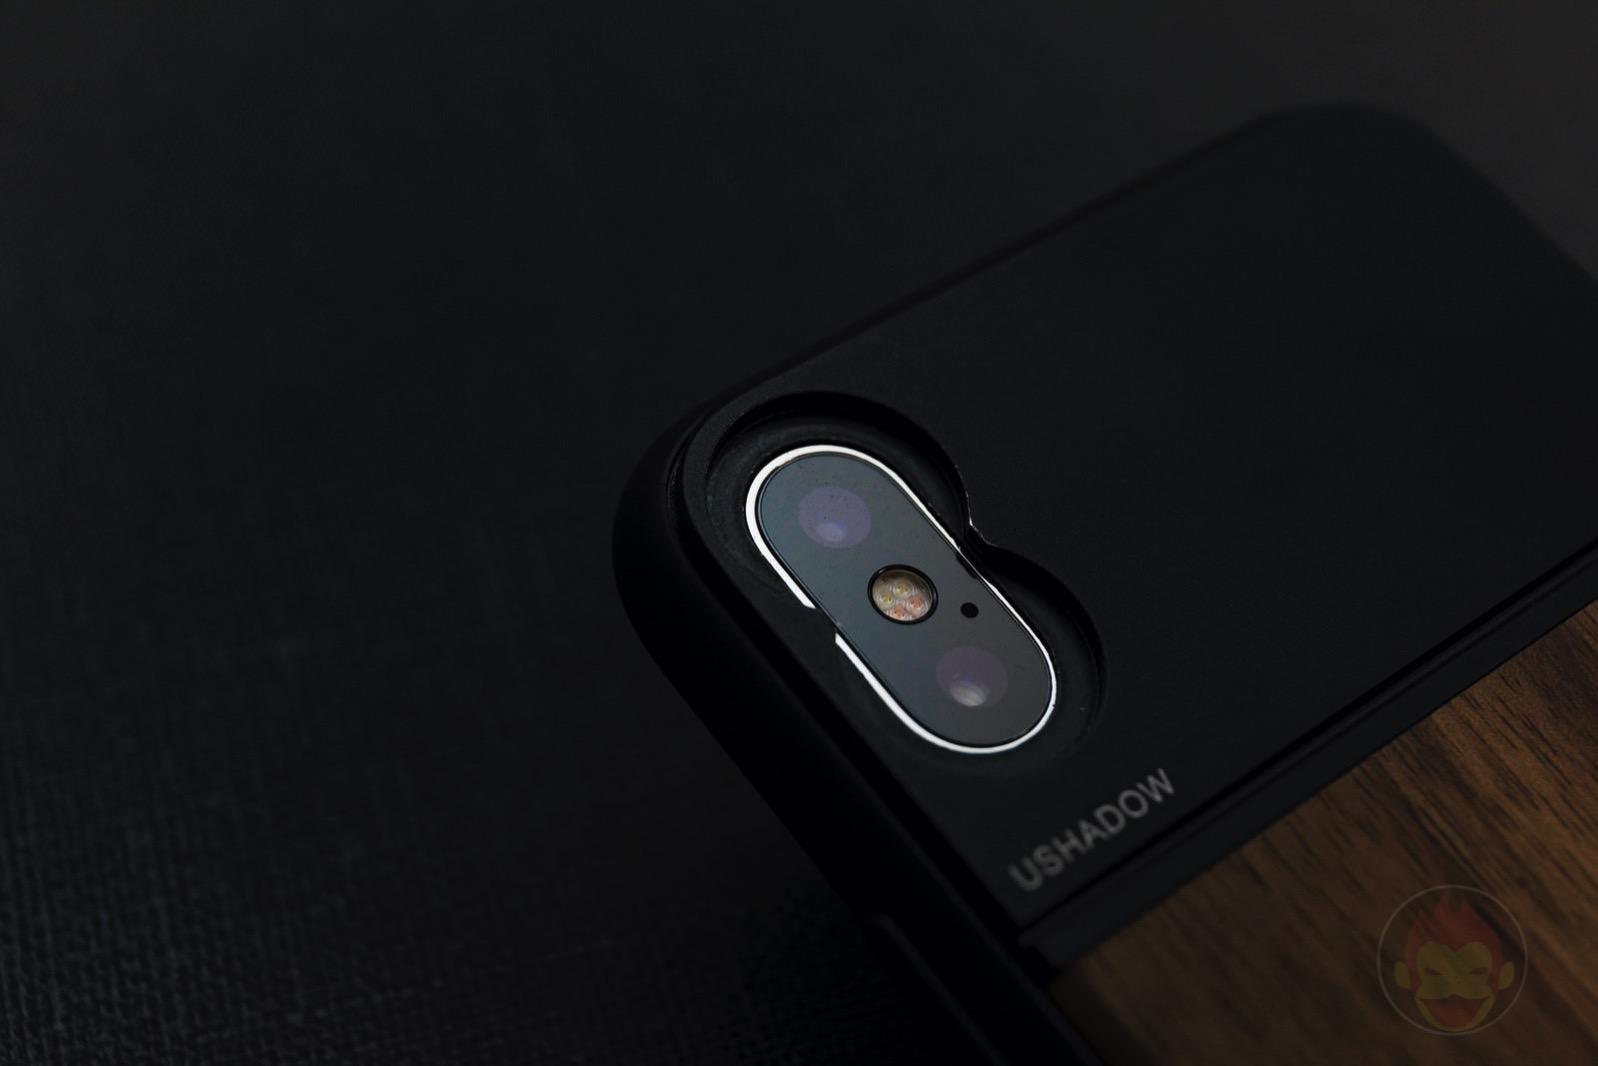 USHADOW-X1-Lens-System-Review-01.jpg